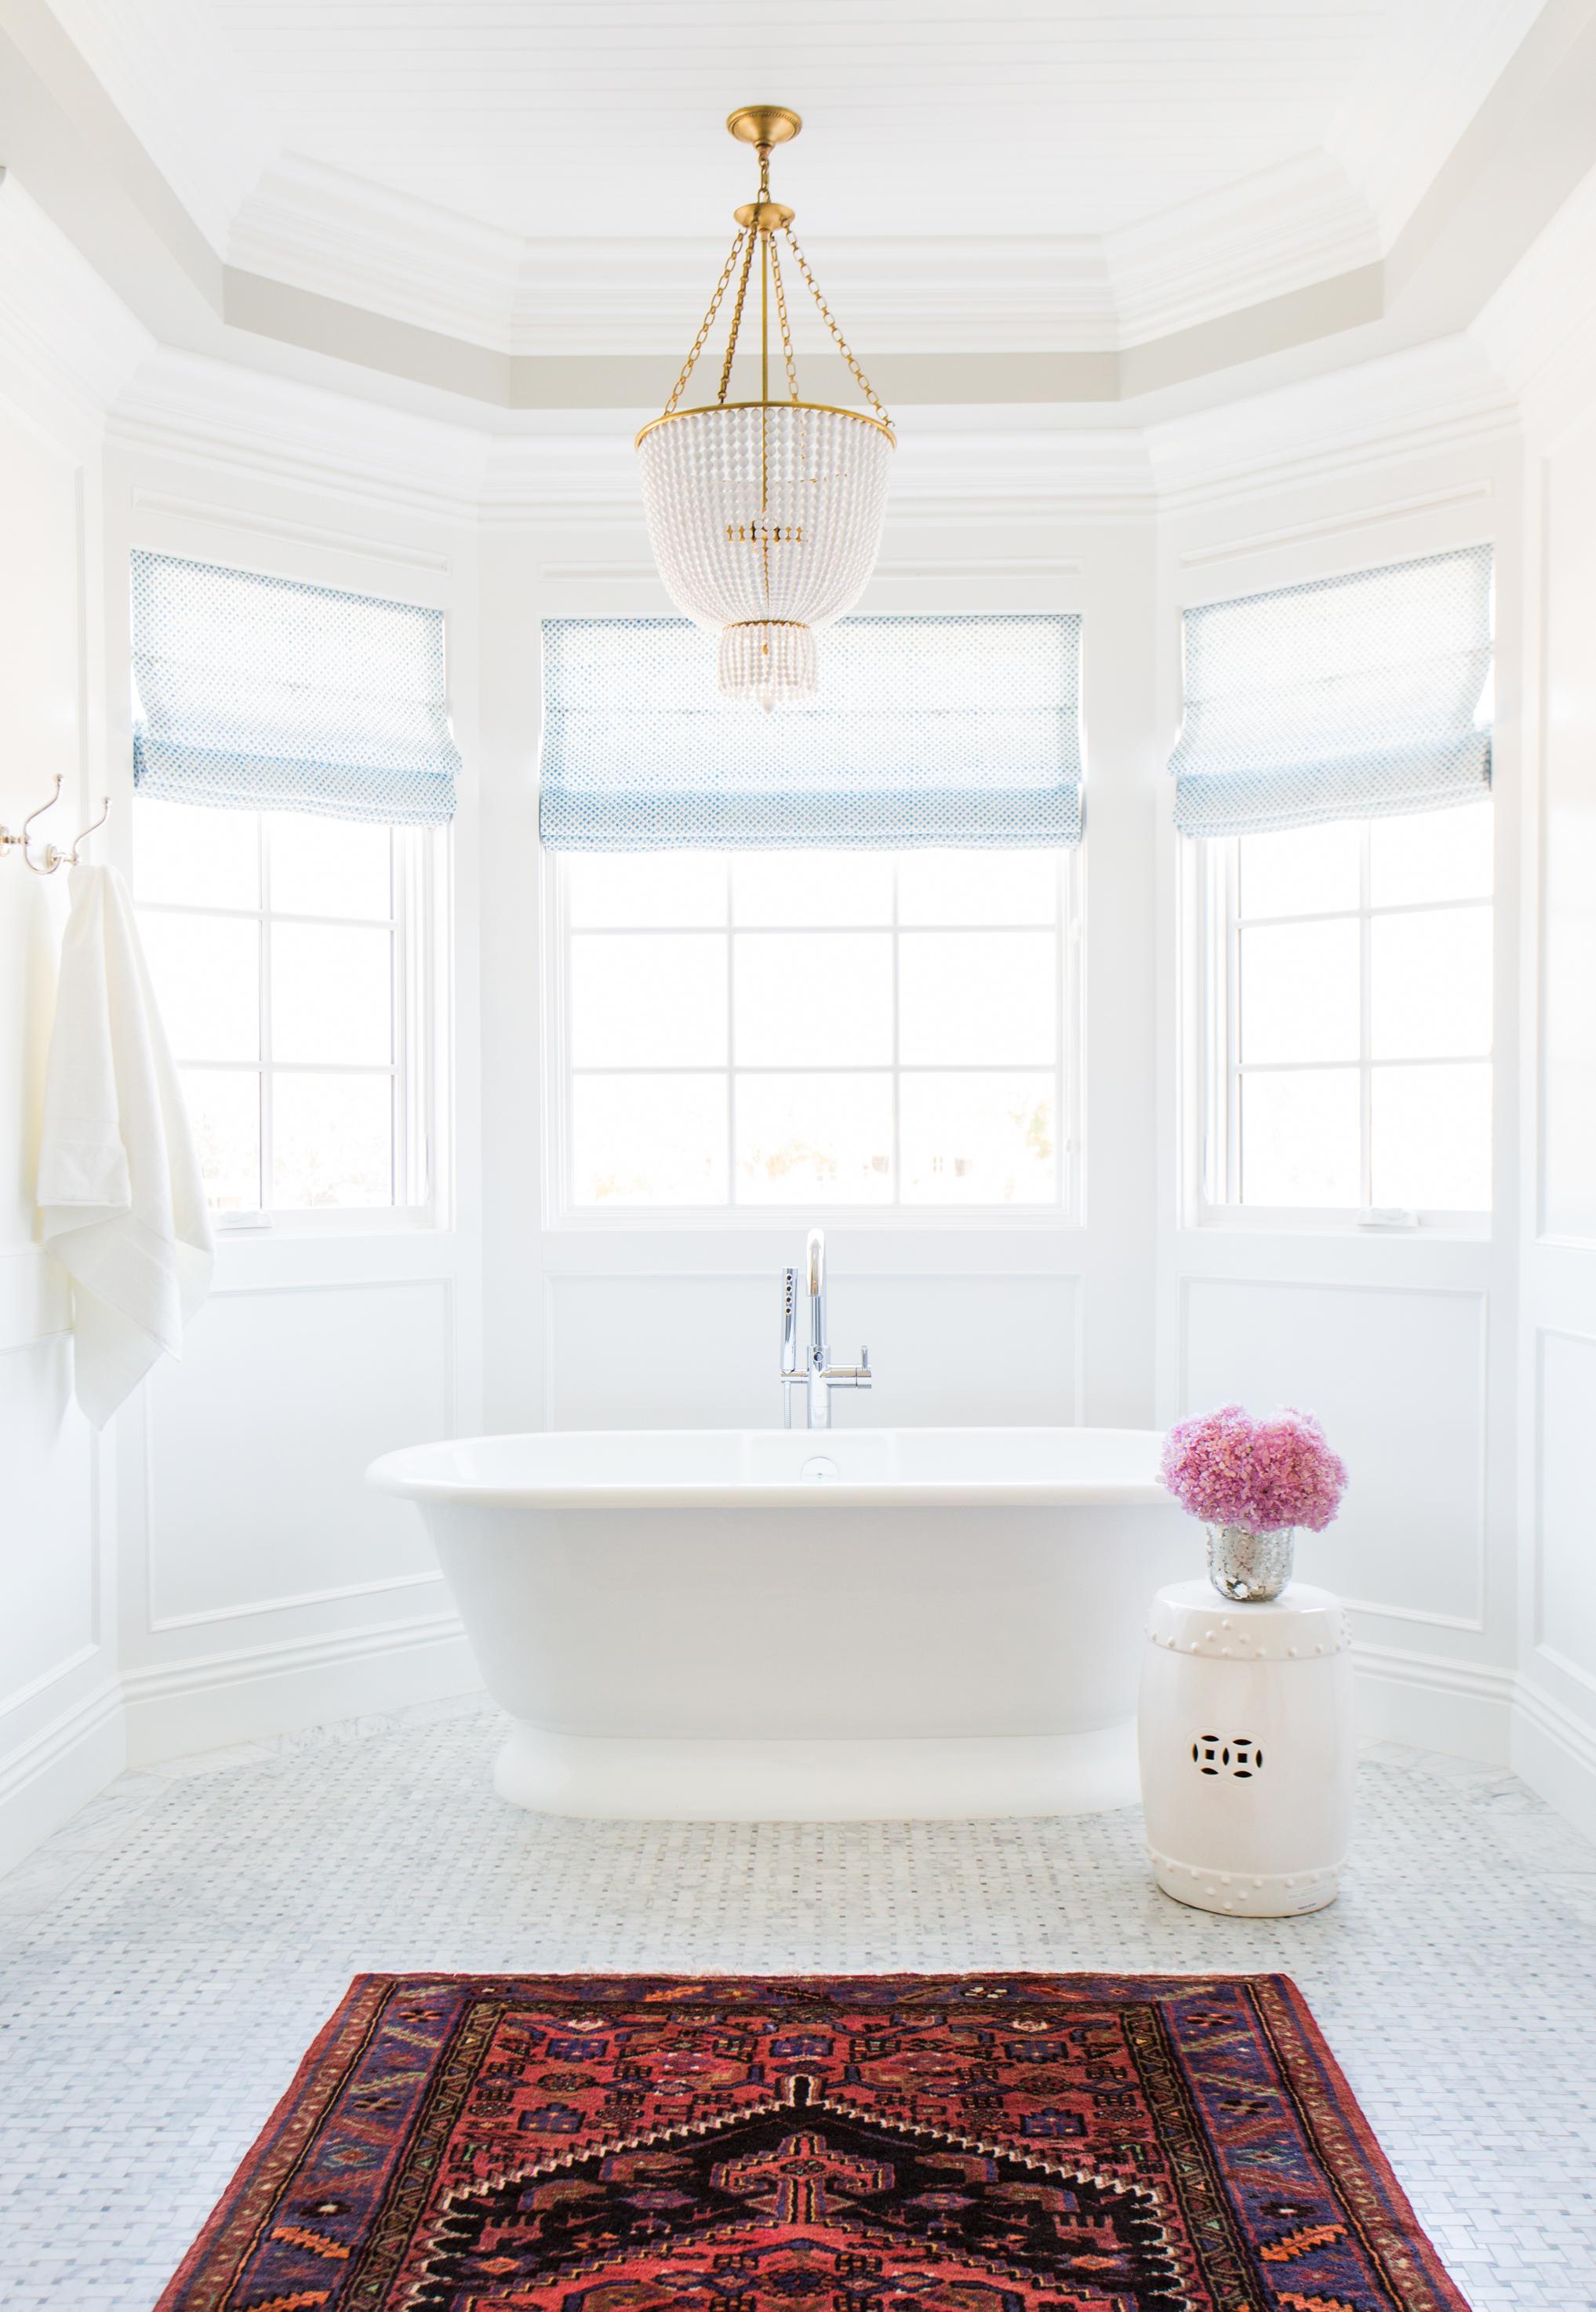 Studio McGee - Pacific Palisades Master Bath